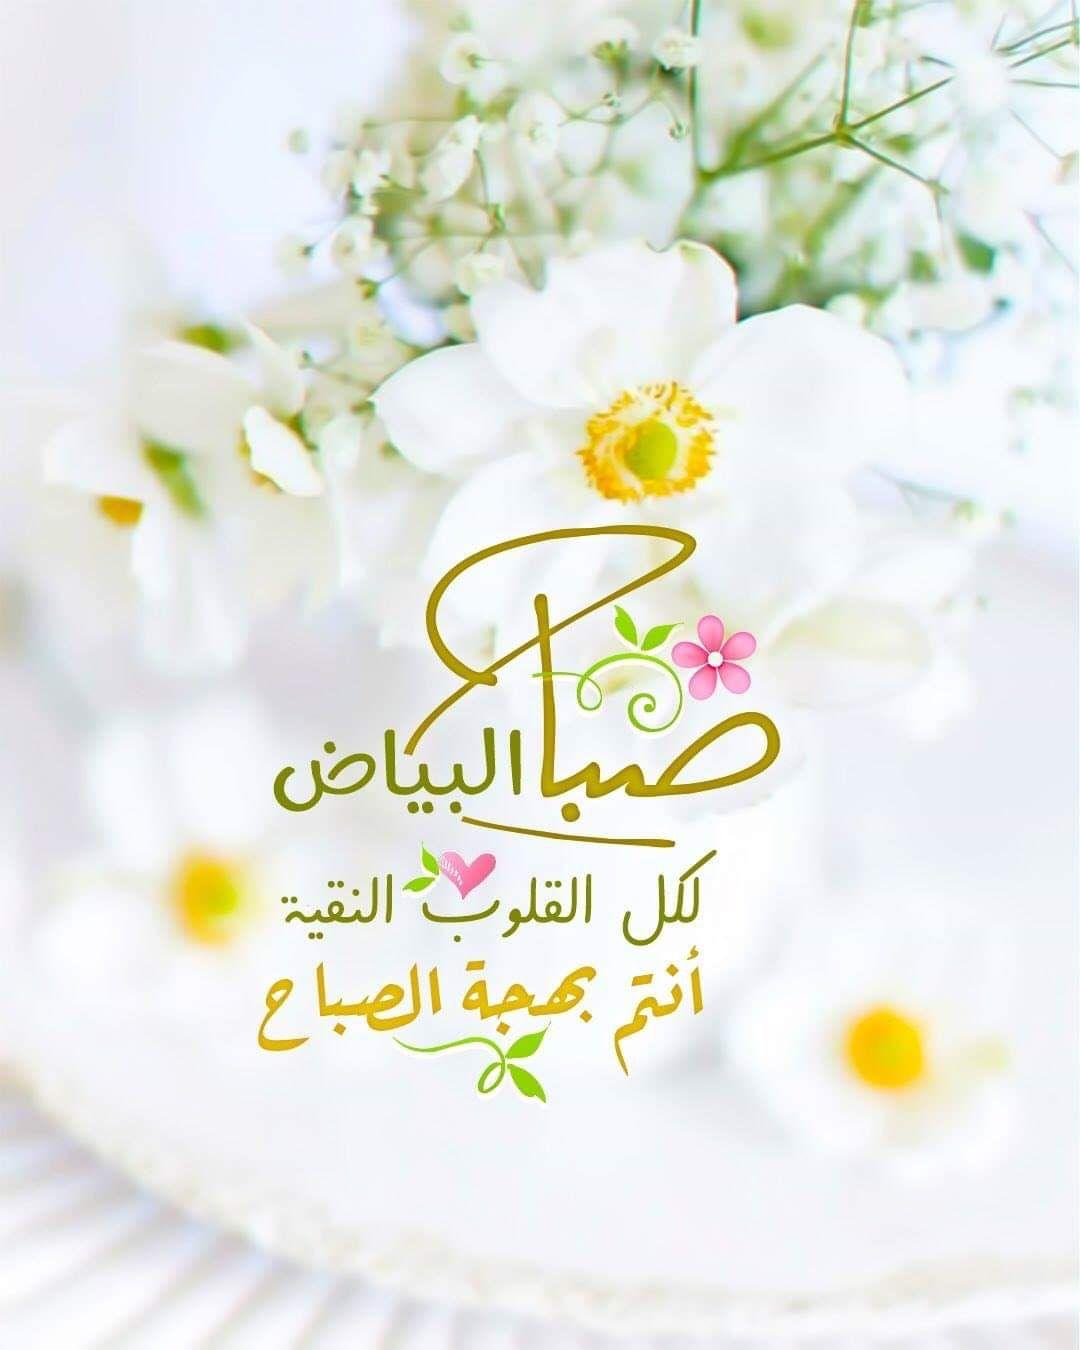 Pin By Amr El Shimy On صباح الخير Good Morning Good Morning Flowers Good Morning Roses Good Morning Photos